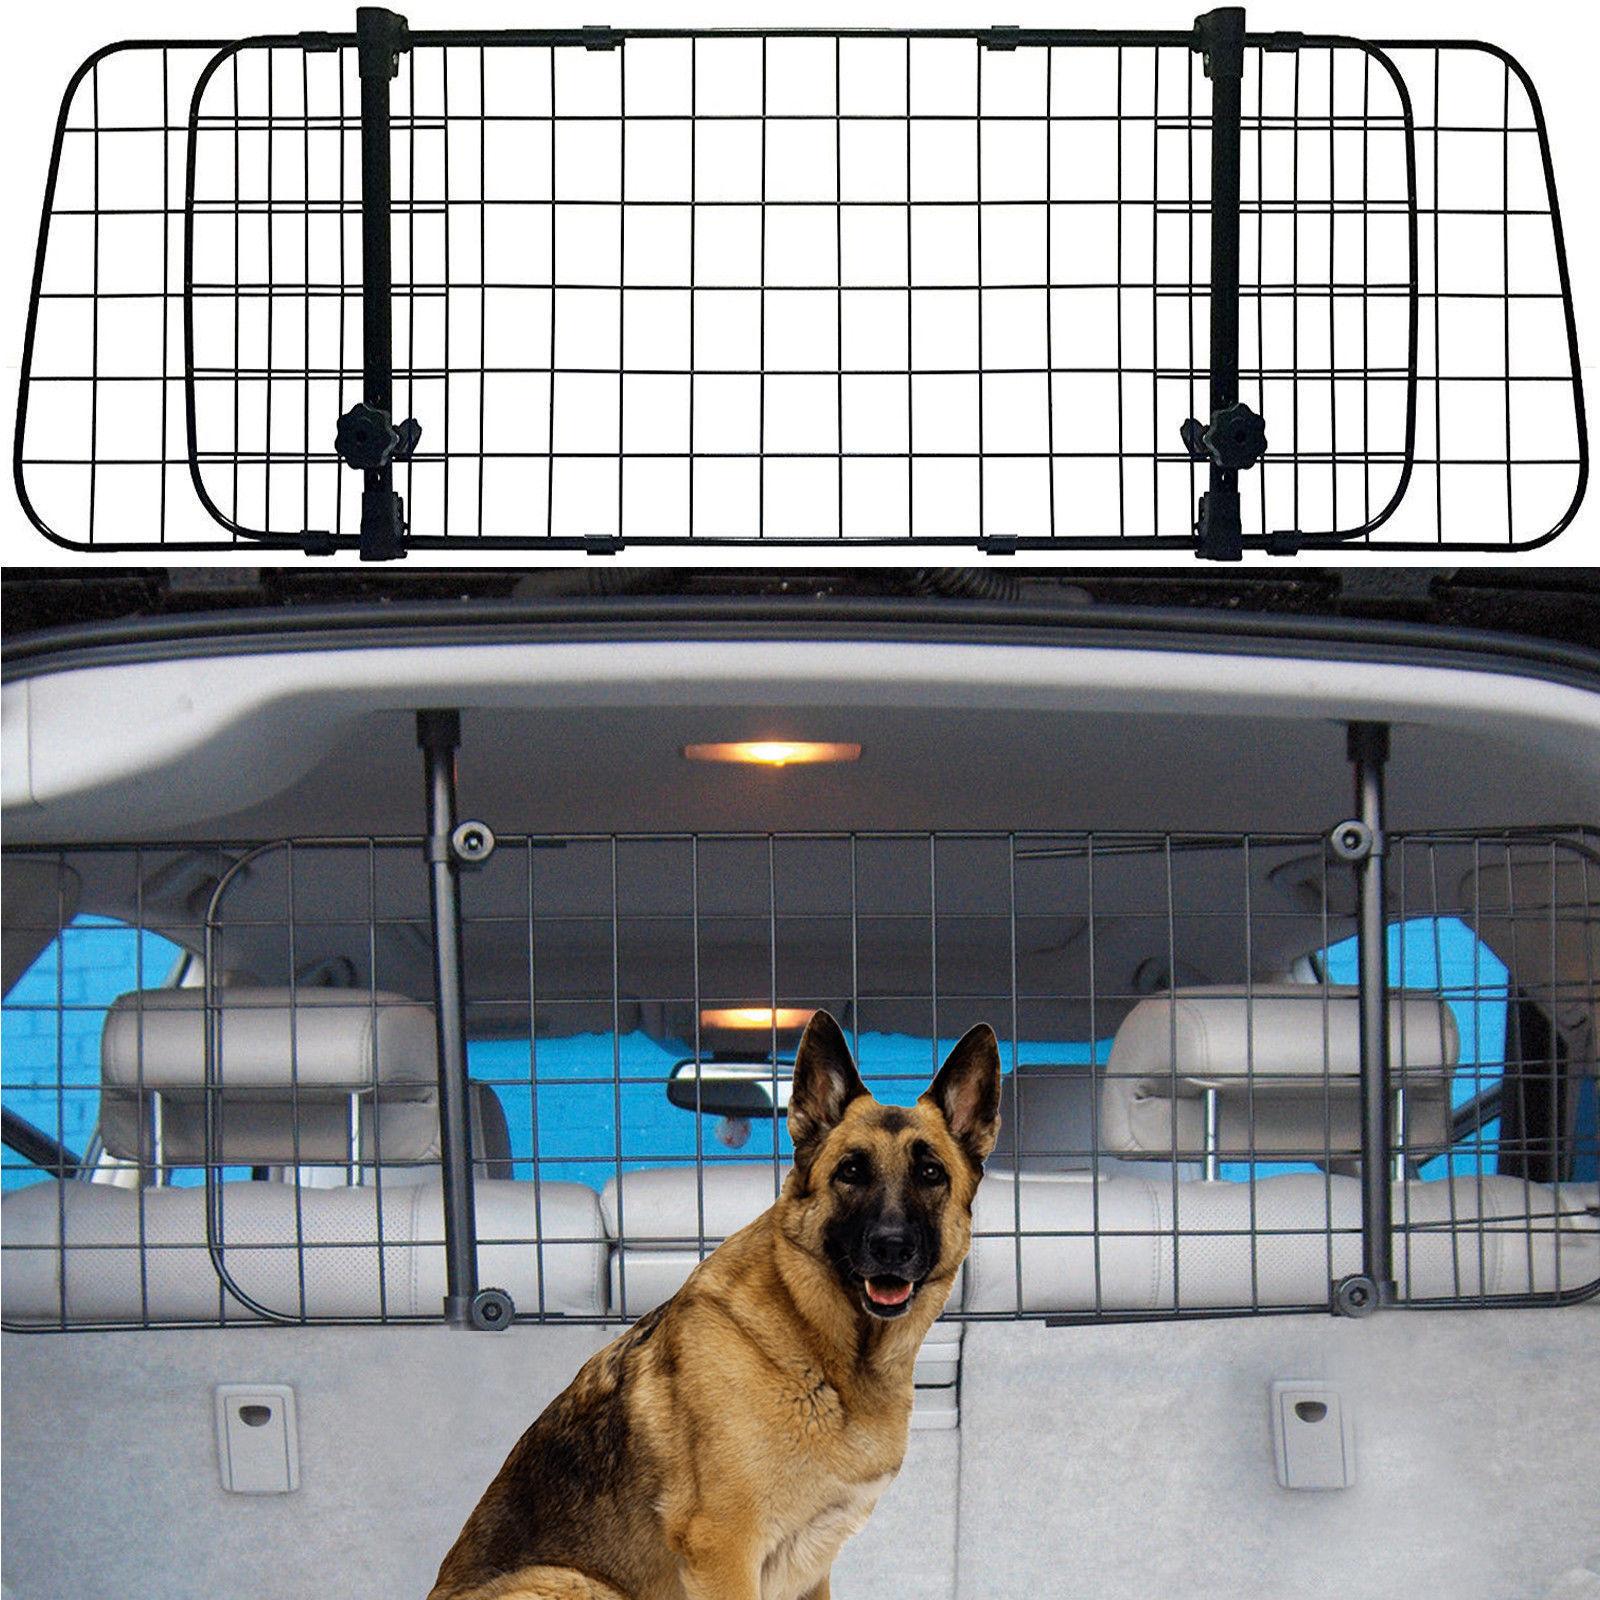 Universal Dog Guard Vehicle Safety Travel Dog Pet Headrest Car Barrier Fence